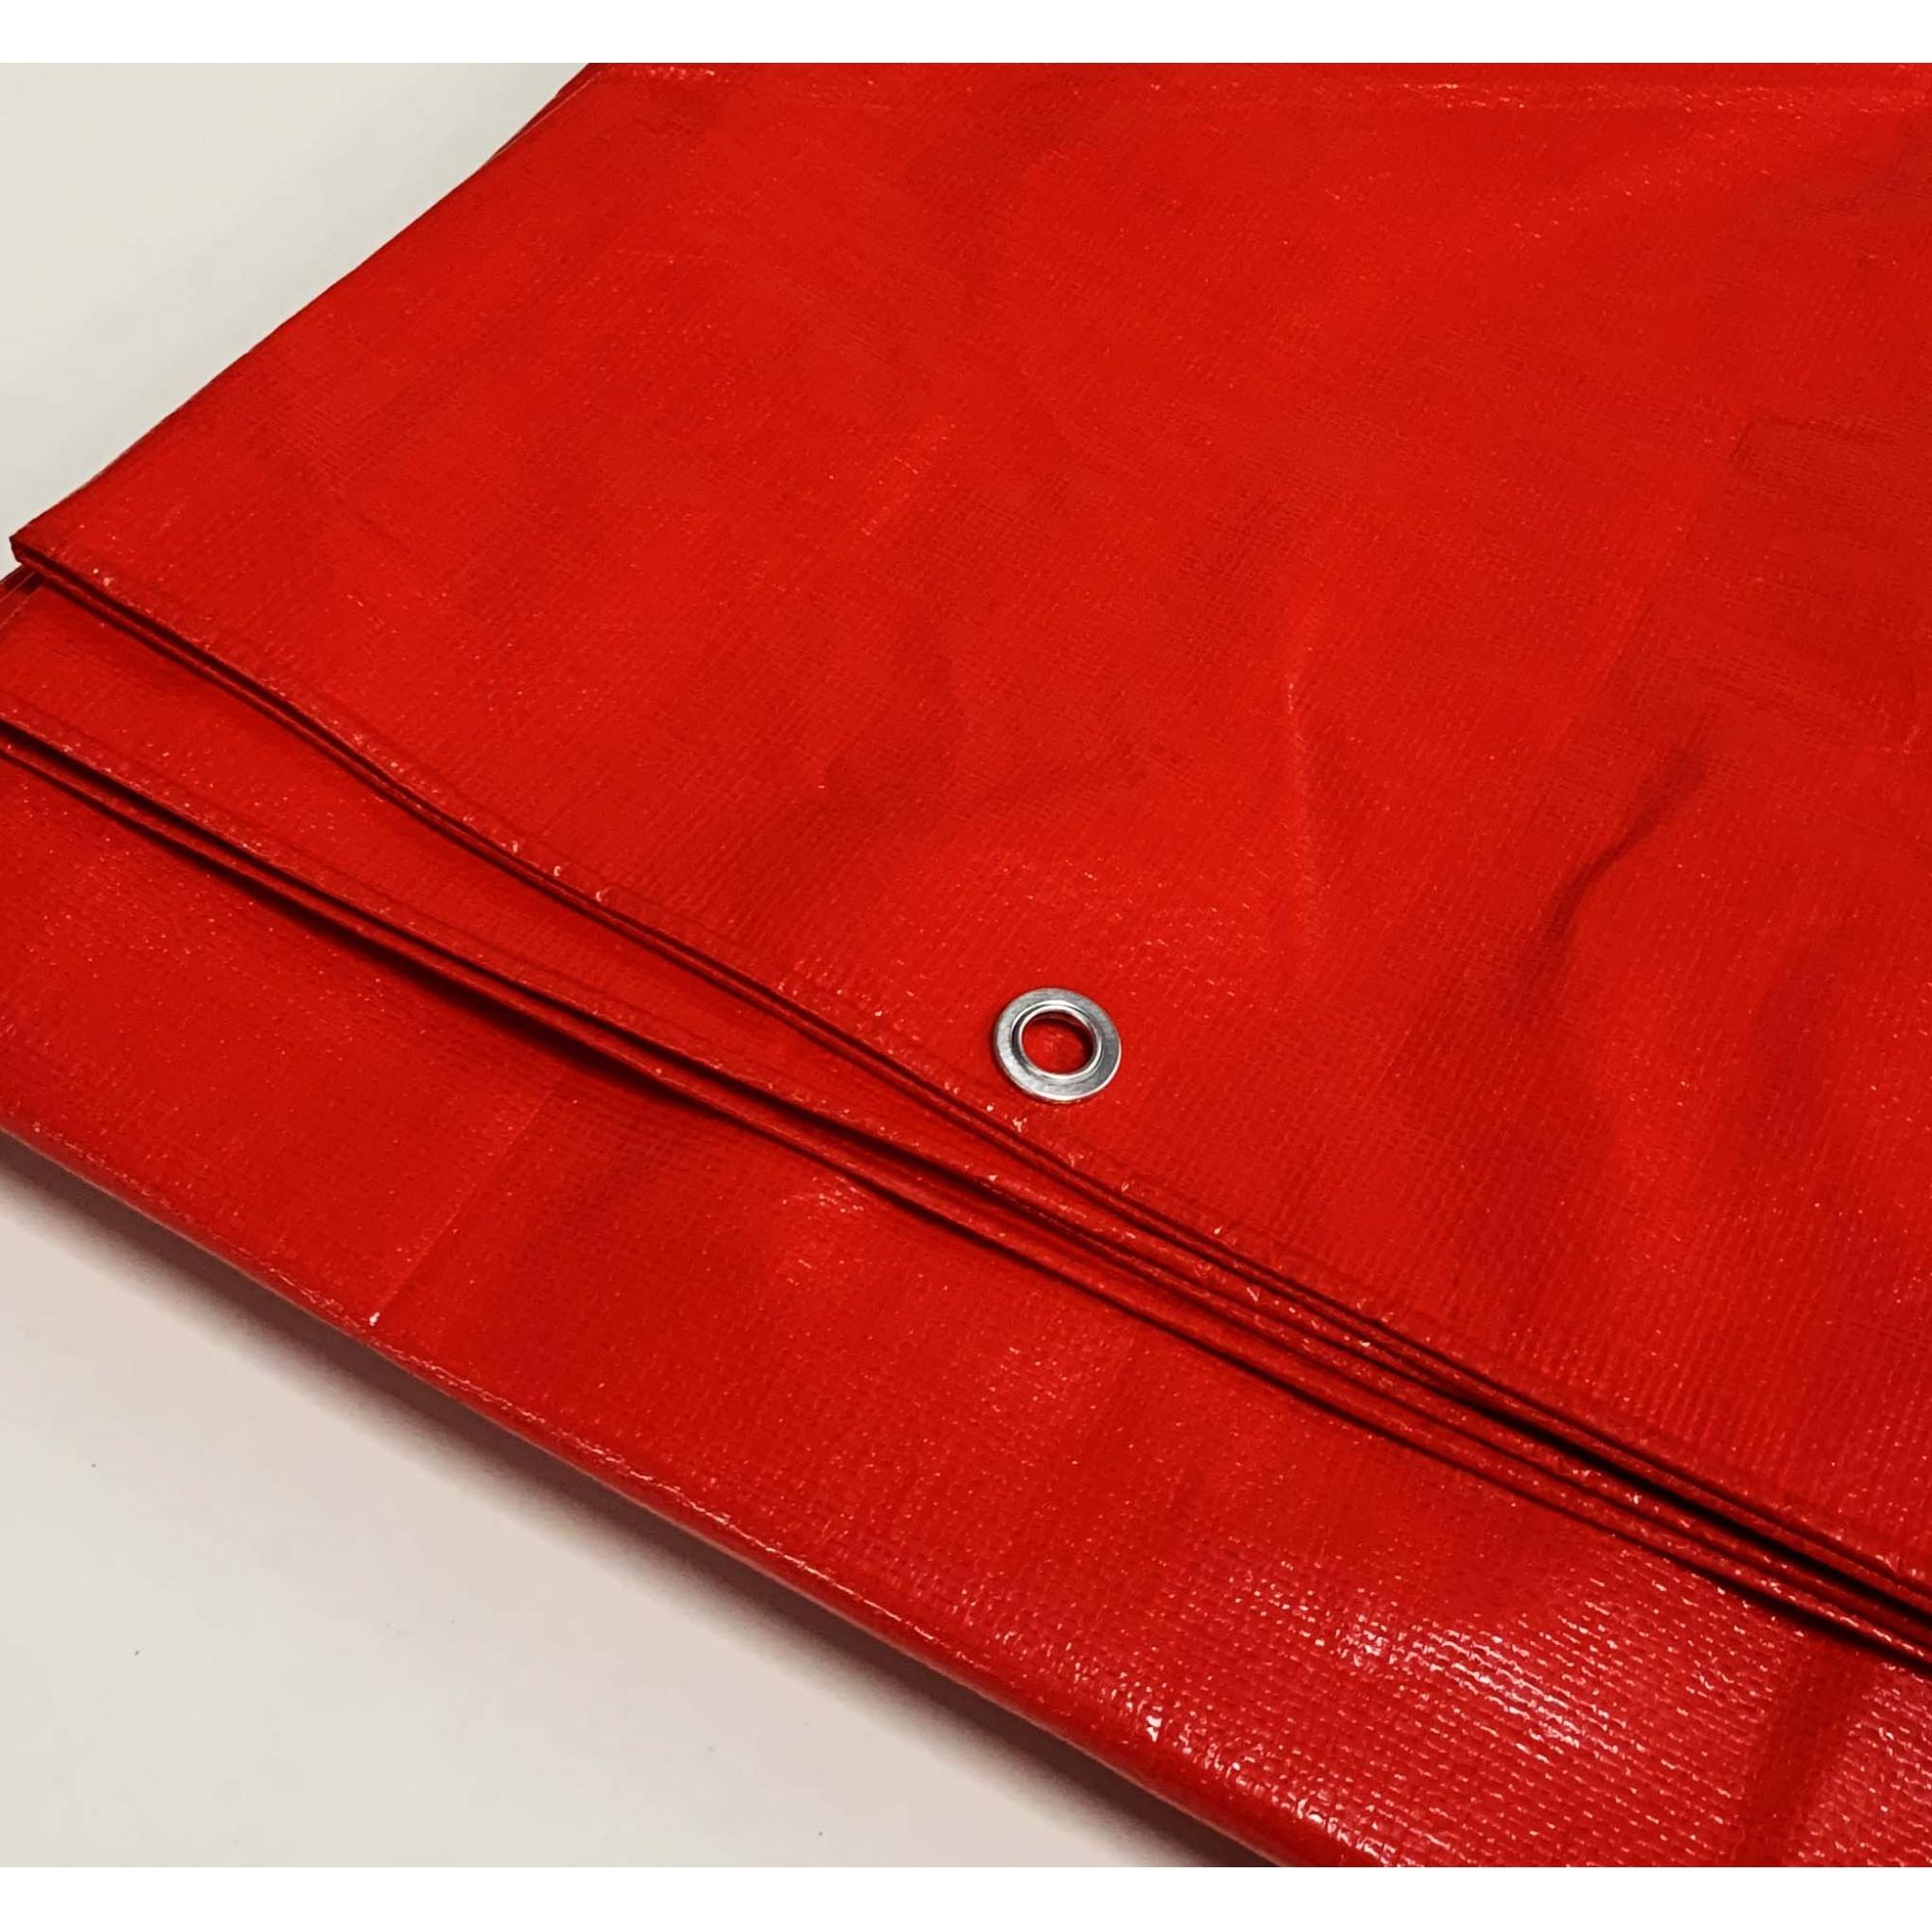 Prolona leve agric vermelho 2x3m